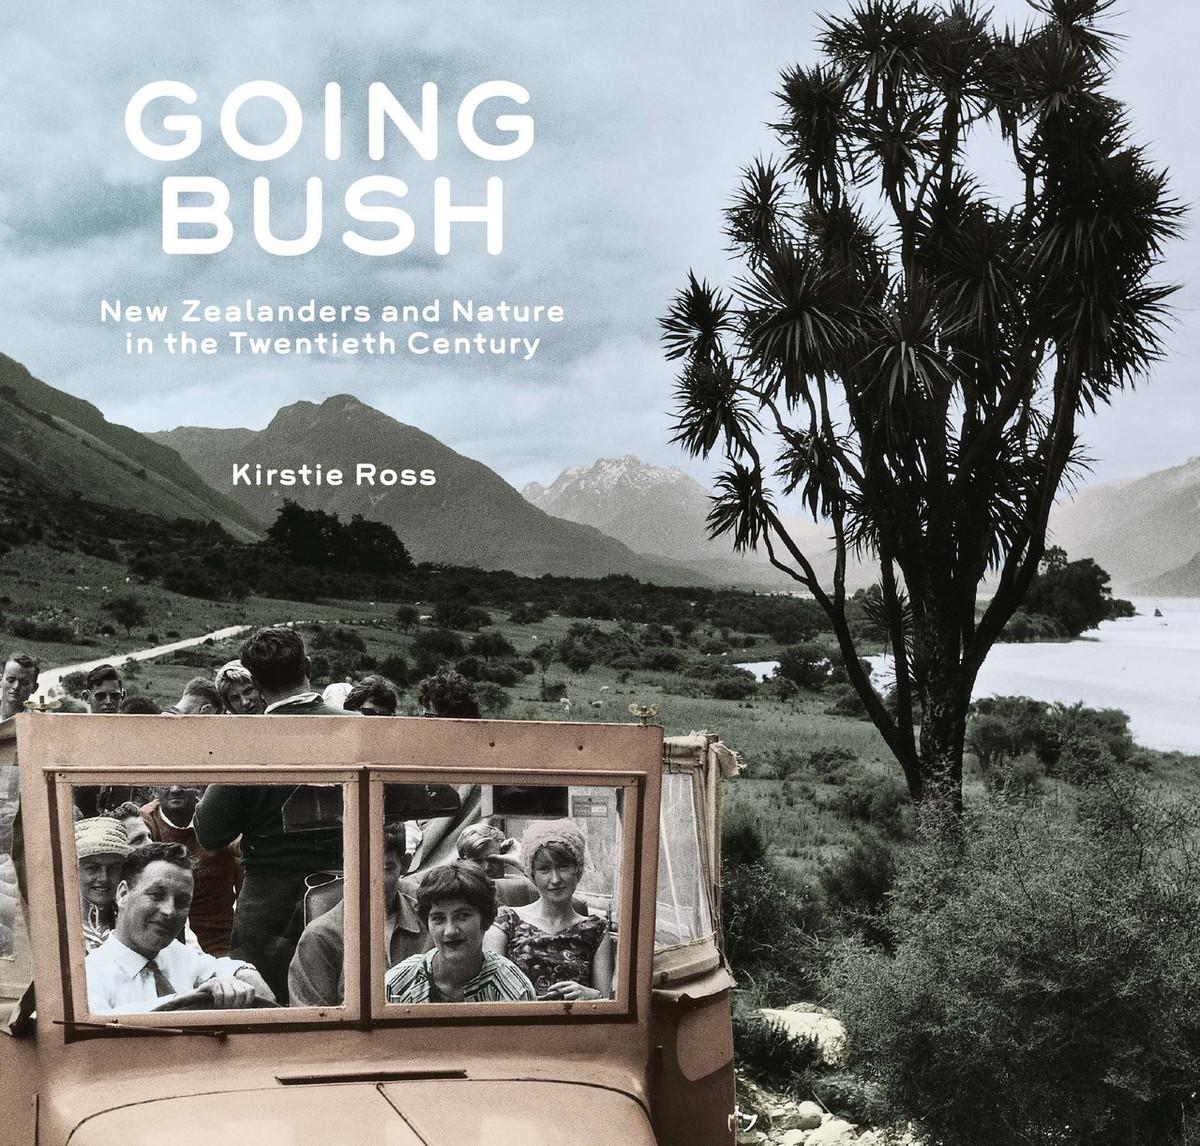 Going Bush: New Zealanders and Nature in the Twentieth Century by Kirstie Ross